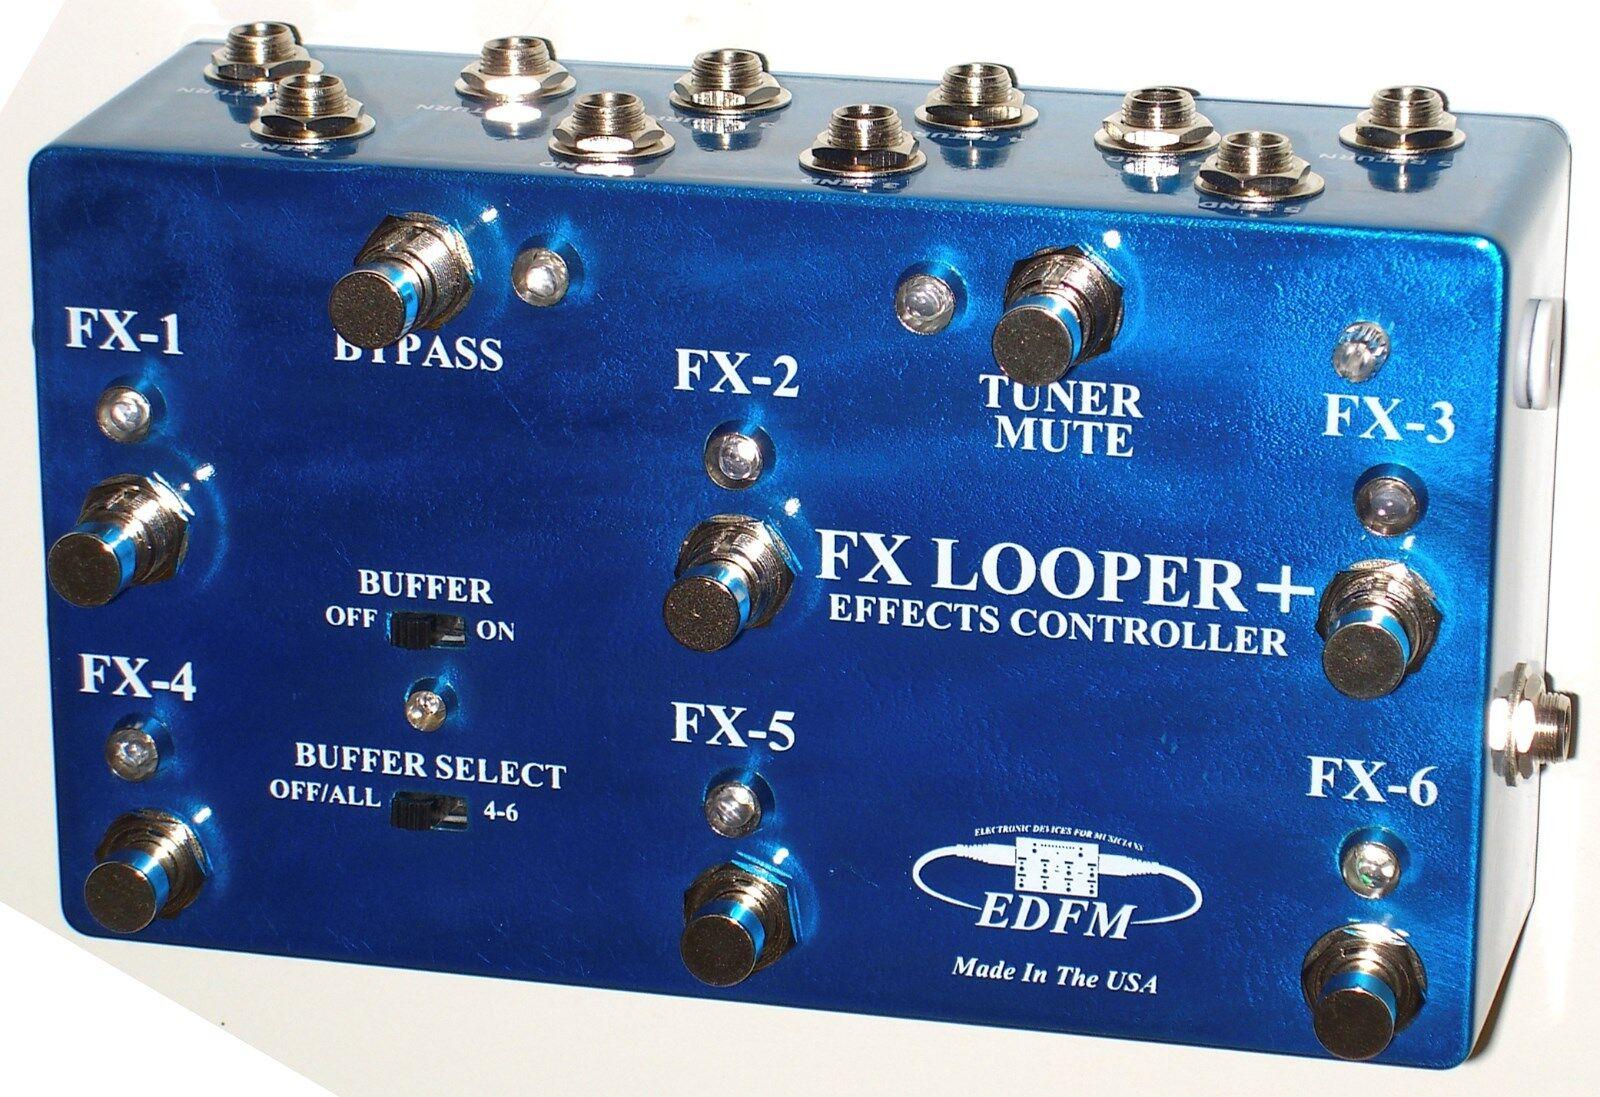 LOOPER EDFM - FX LOOPER + EFFECTS CONTROLLER